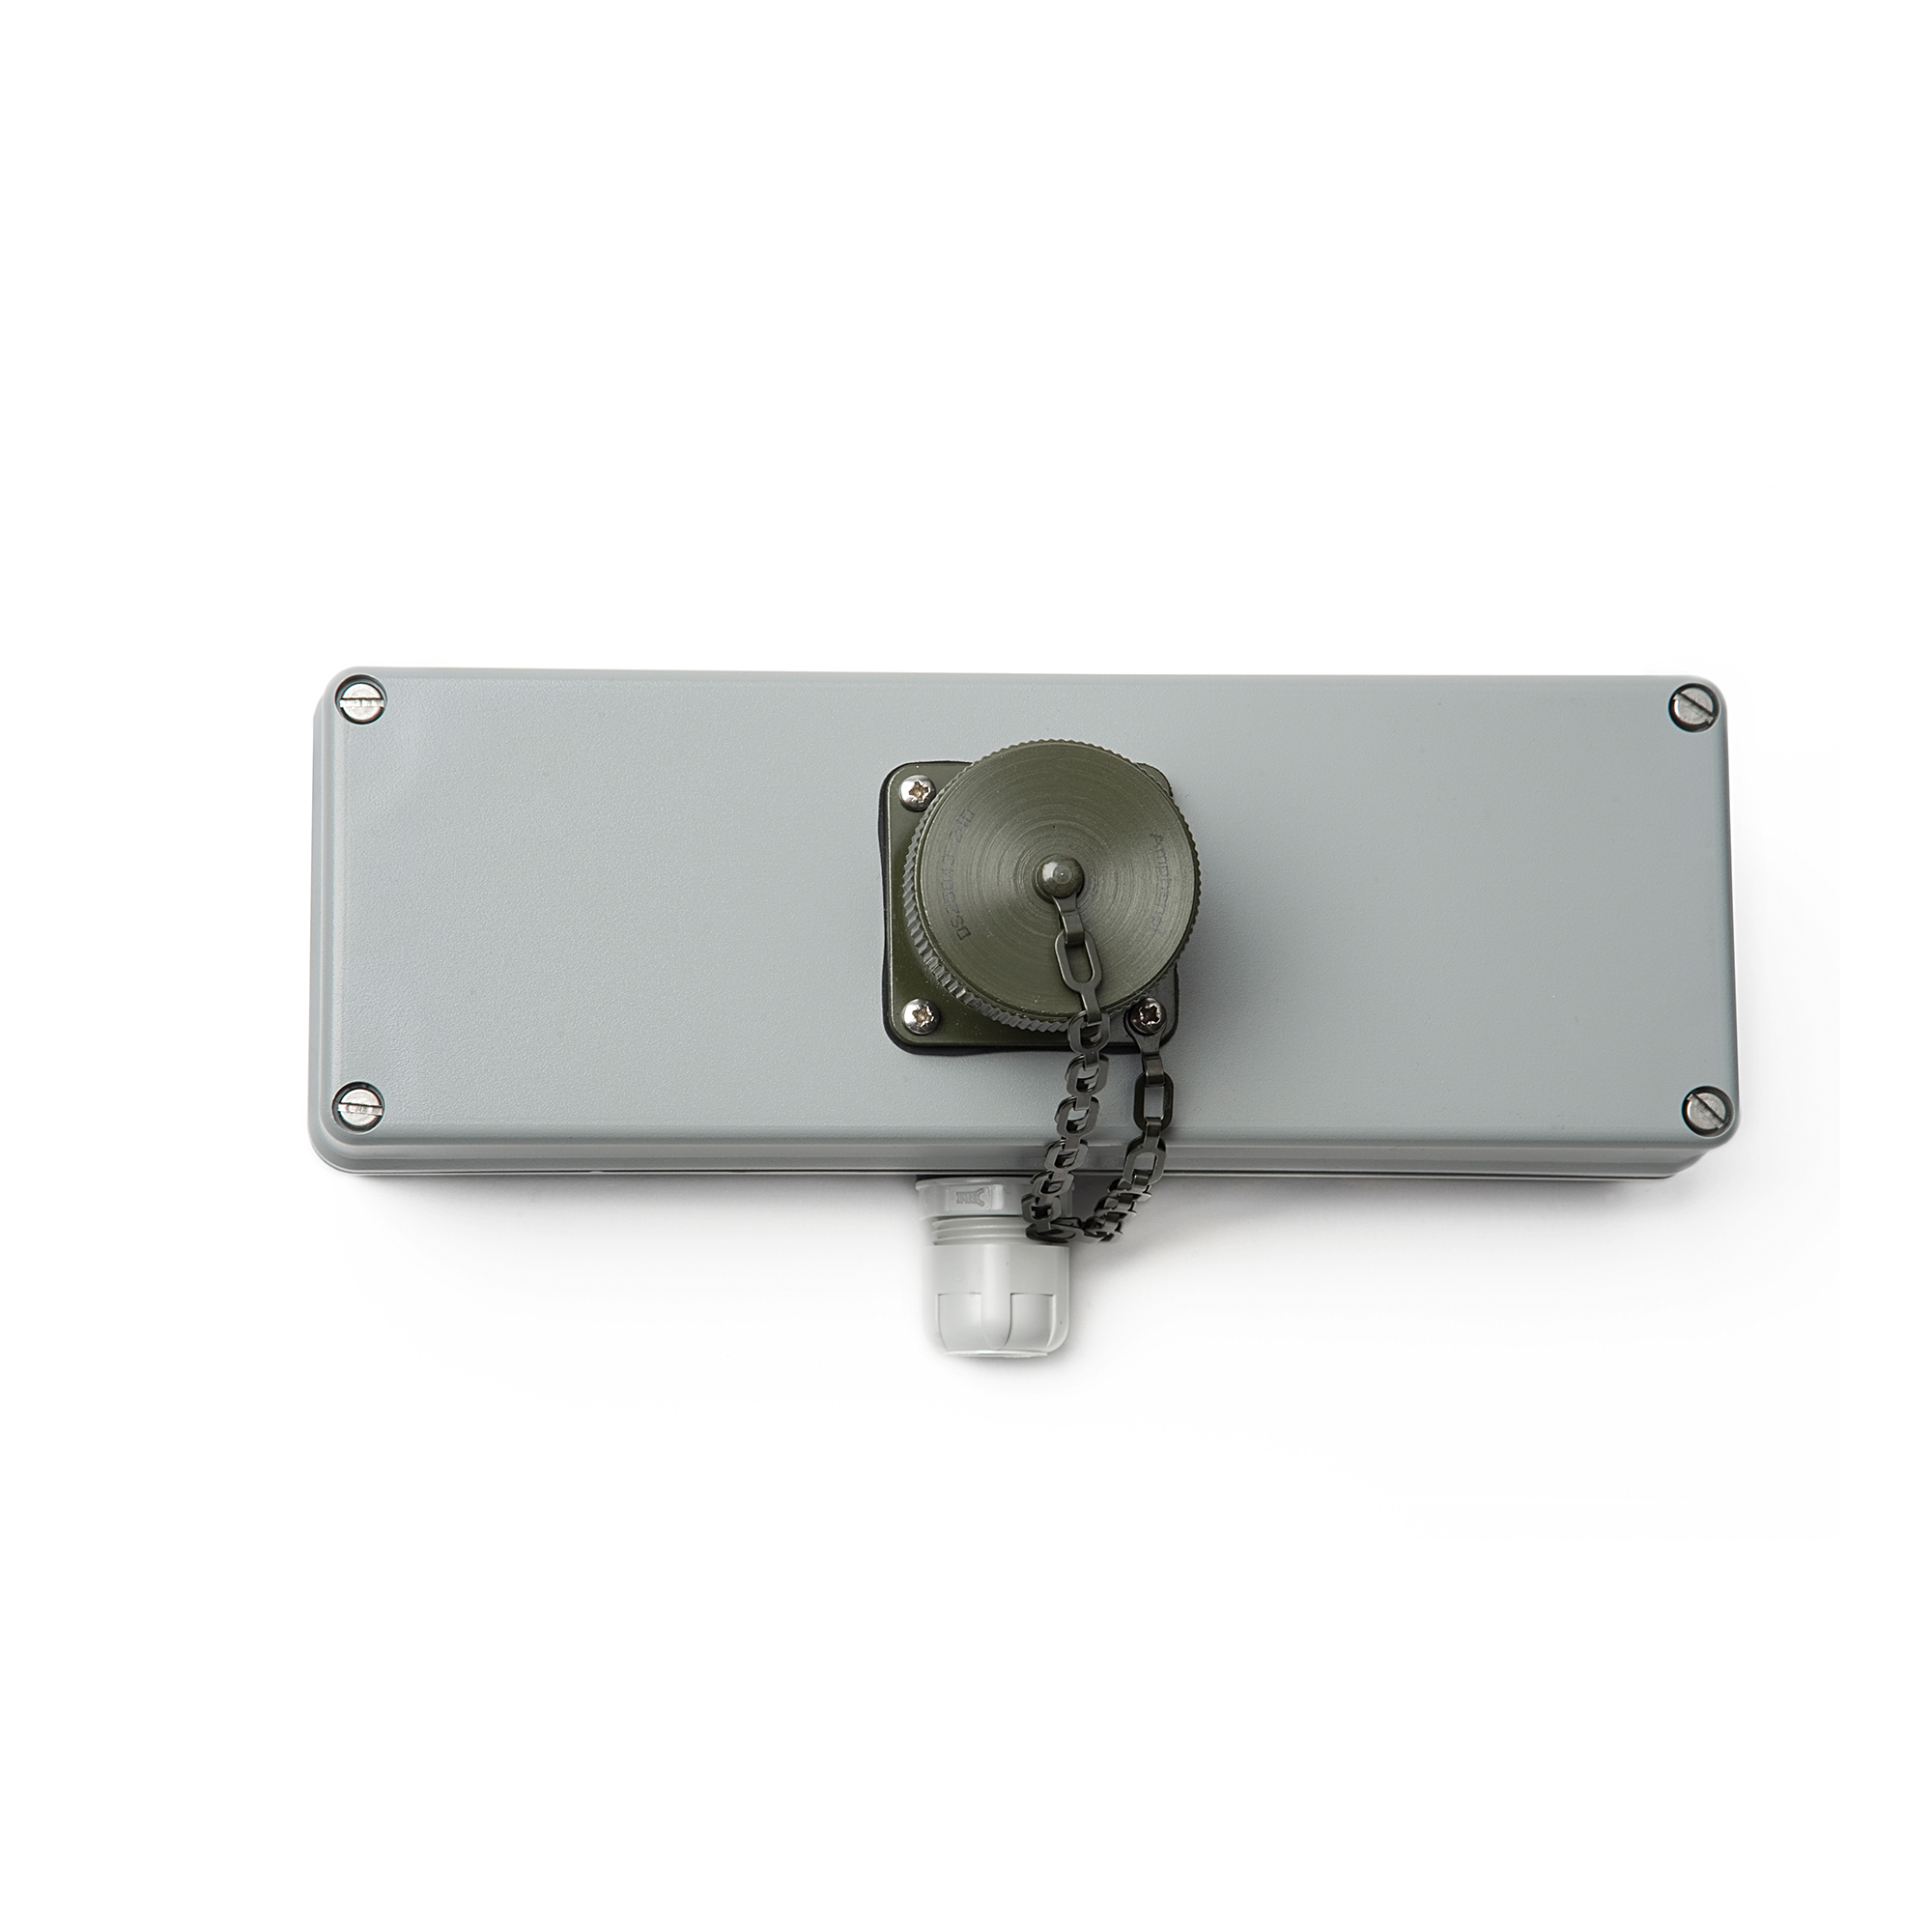 CD-16 Plugbox picture